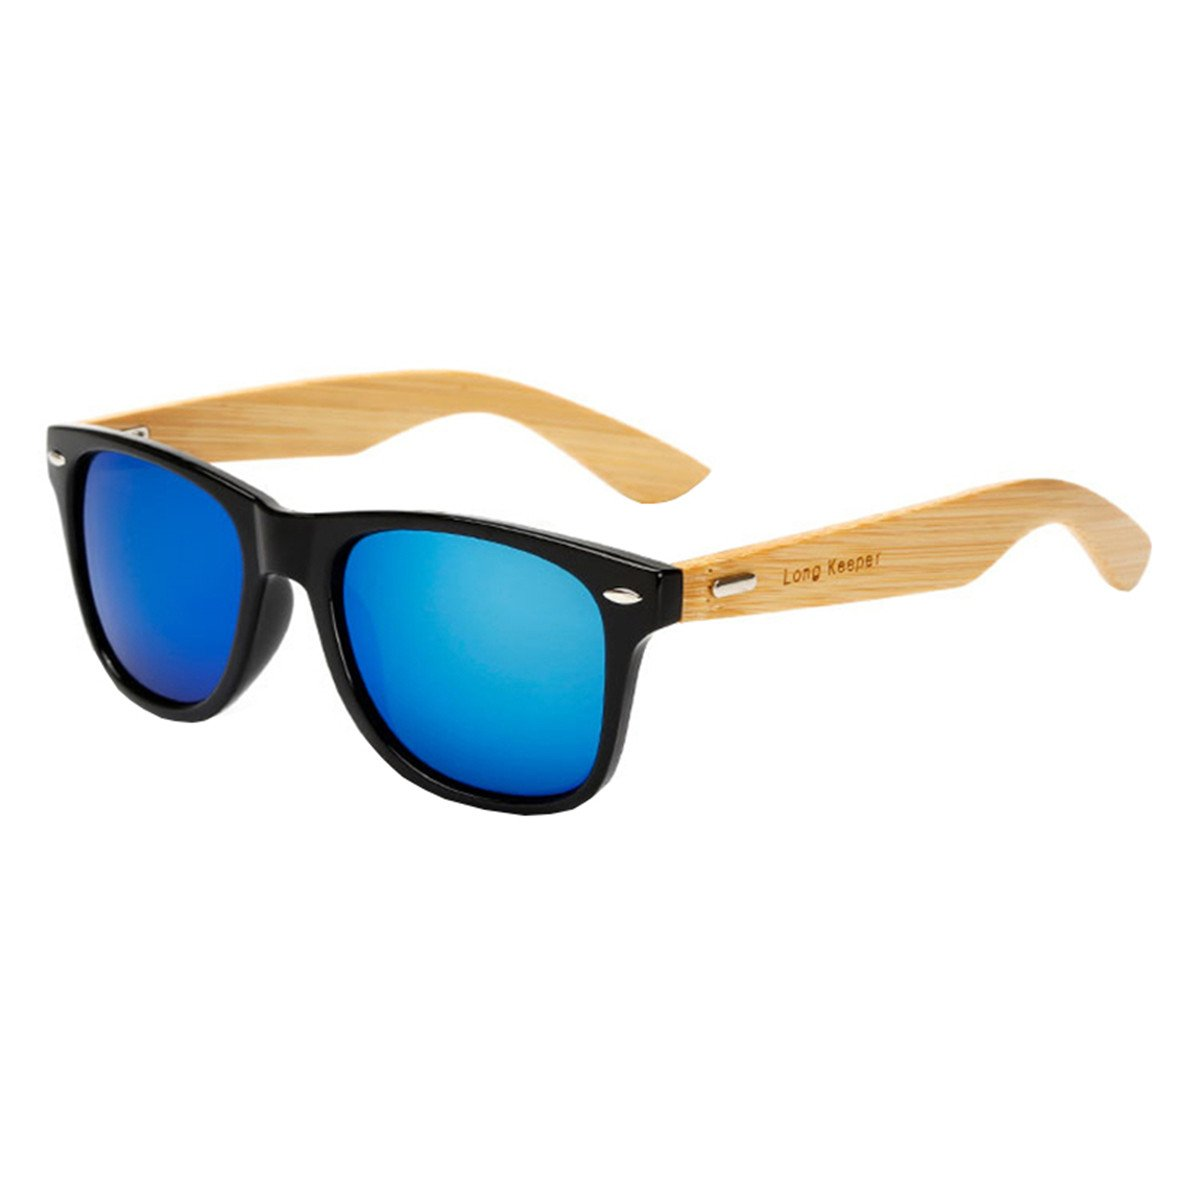 6e108d3a33a Amazon.com  Long Keeper Bamboo Wood Arms Sunglasses for Women Men (Black